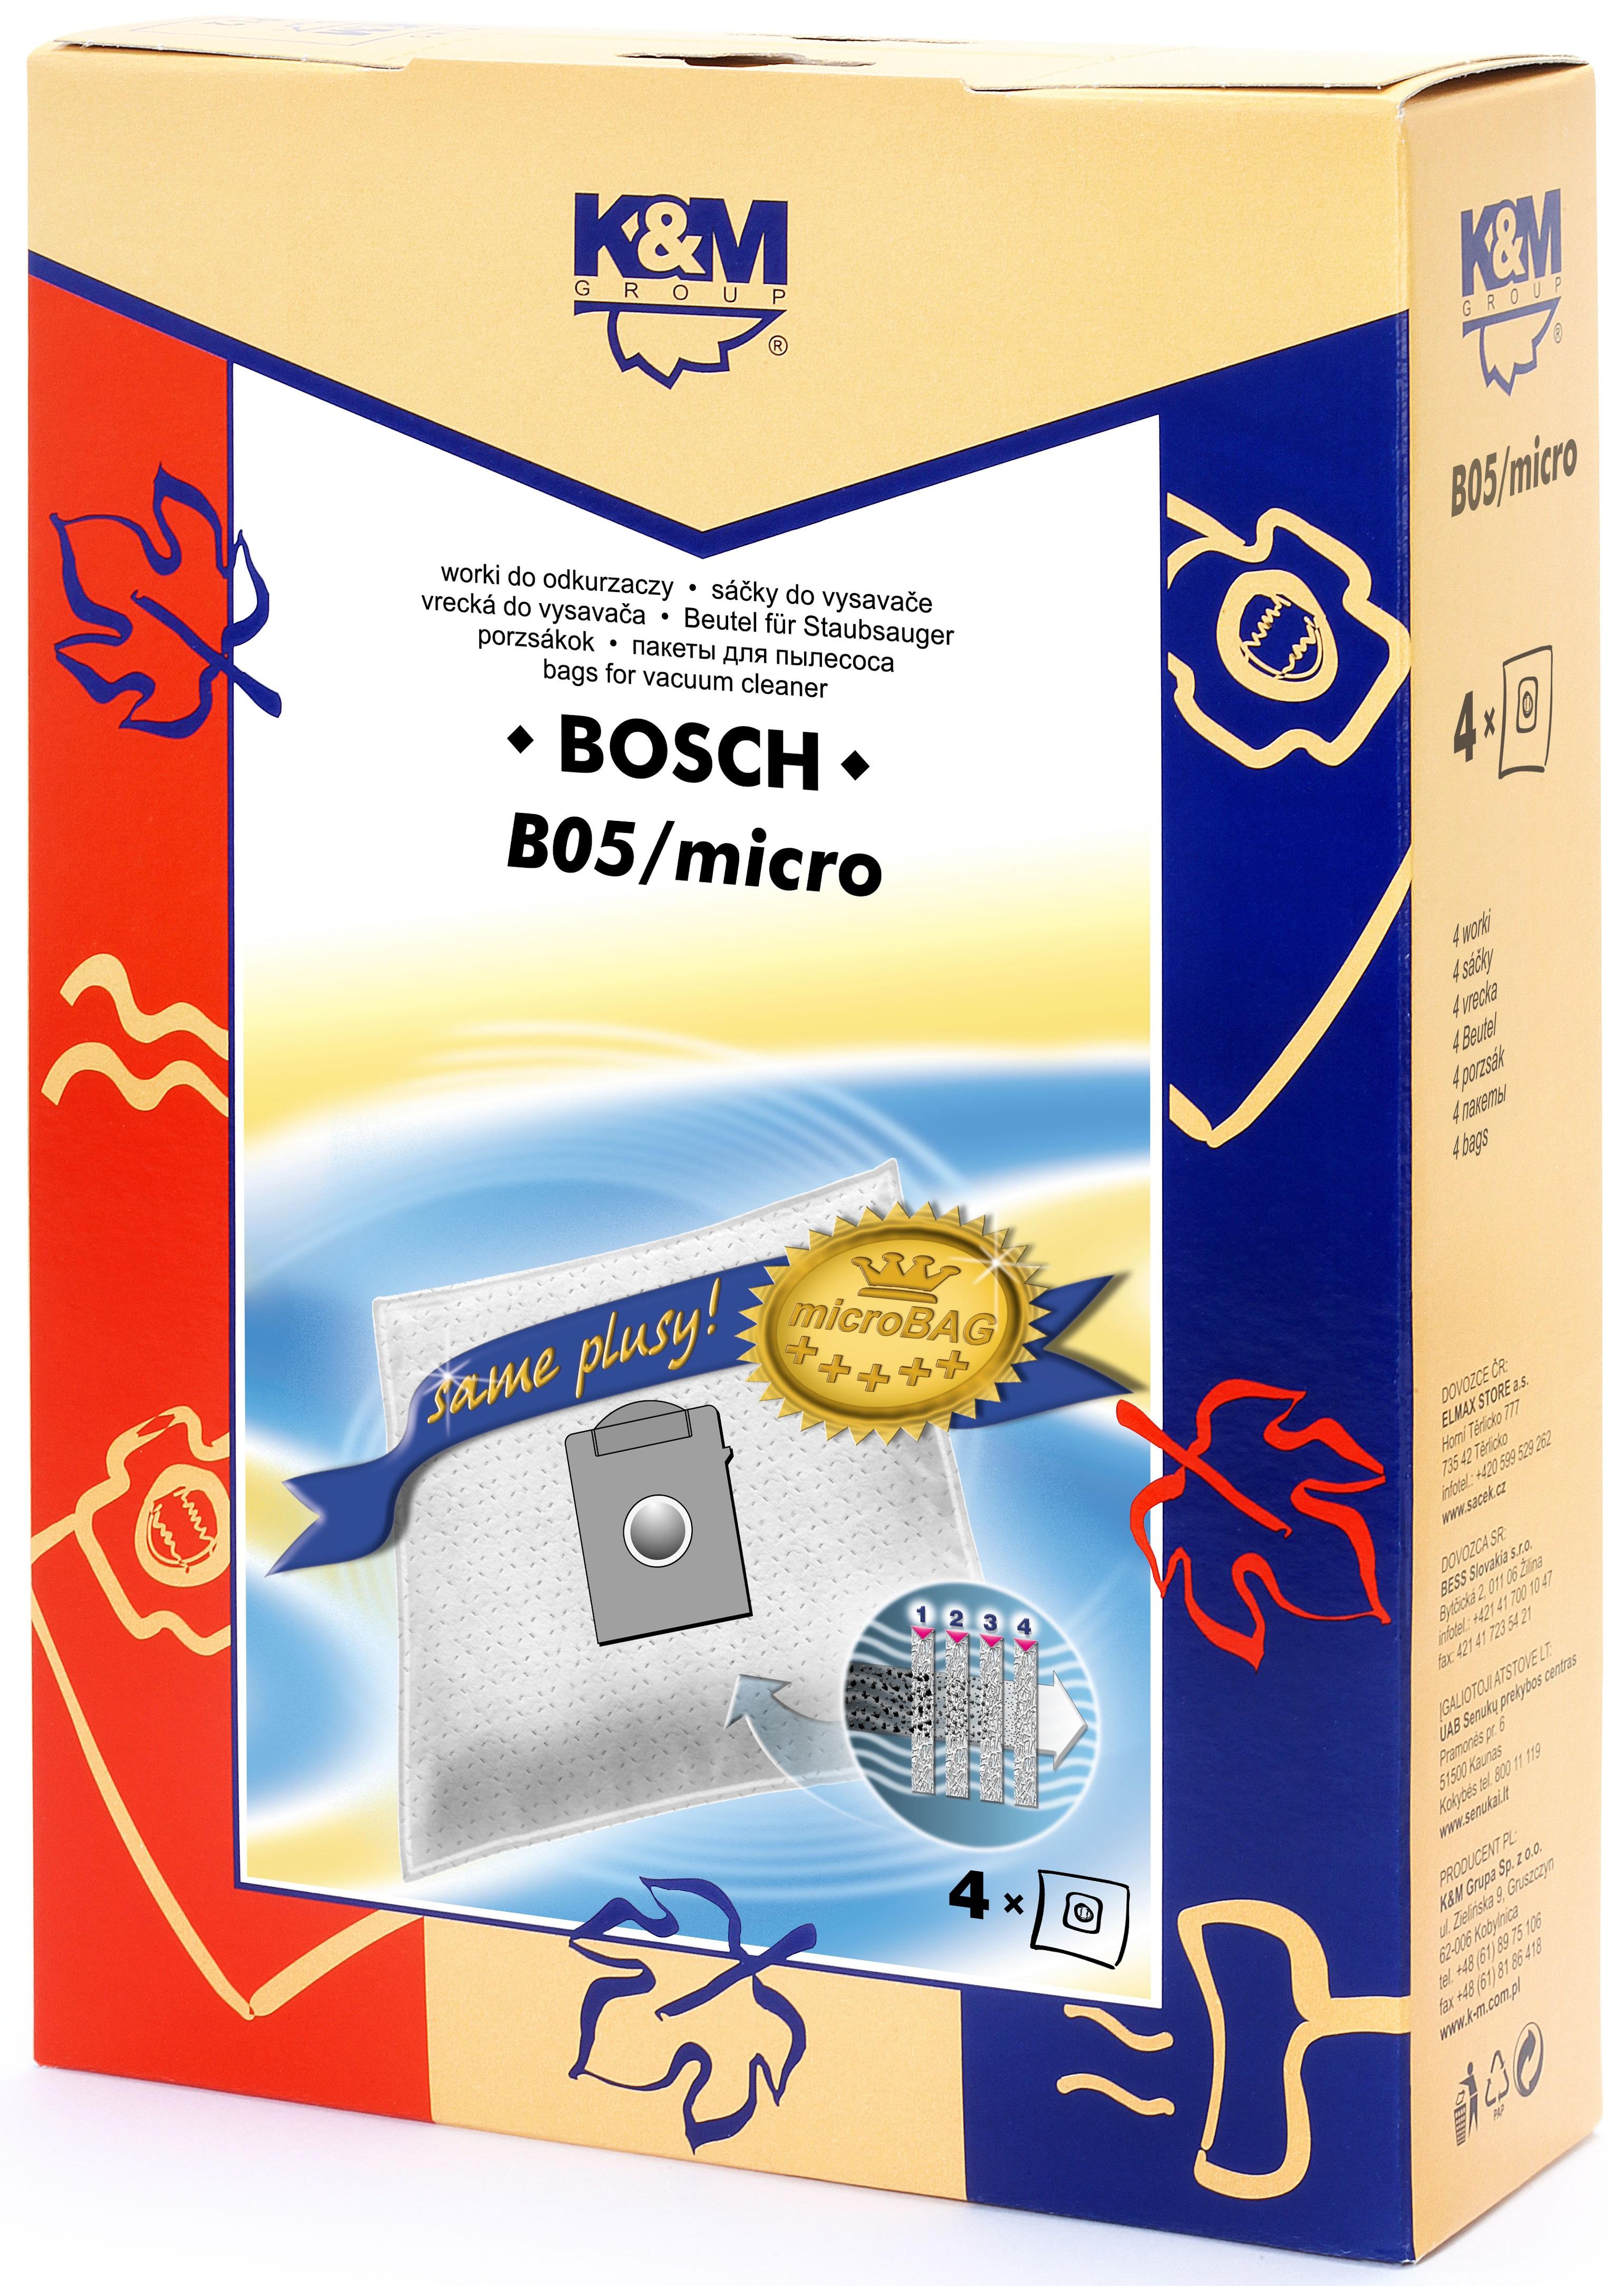 Sac aspirator pentru Bosch/Siemens typ K, sintetic, 4 X saci, K&M [0]